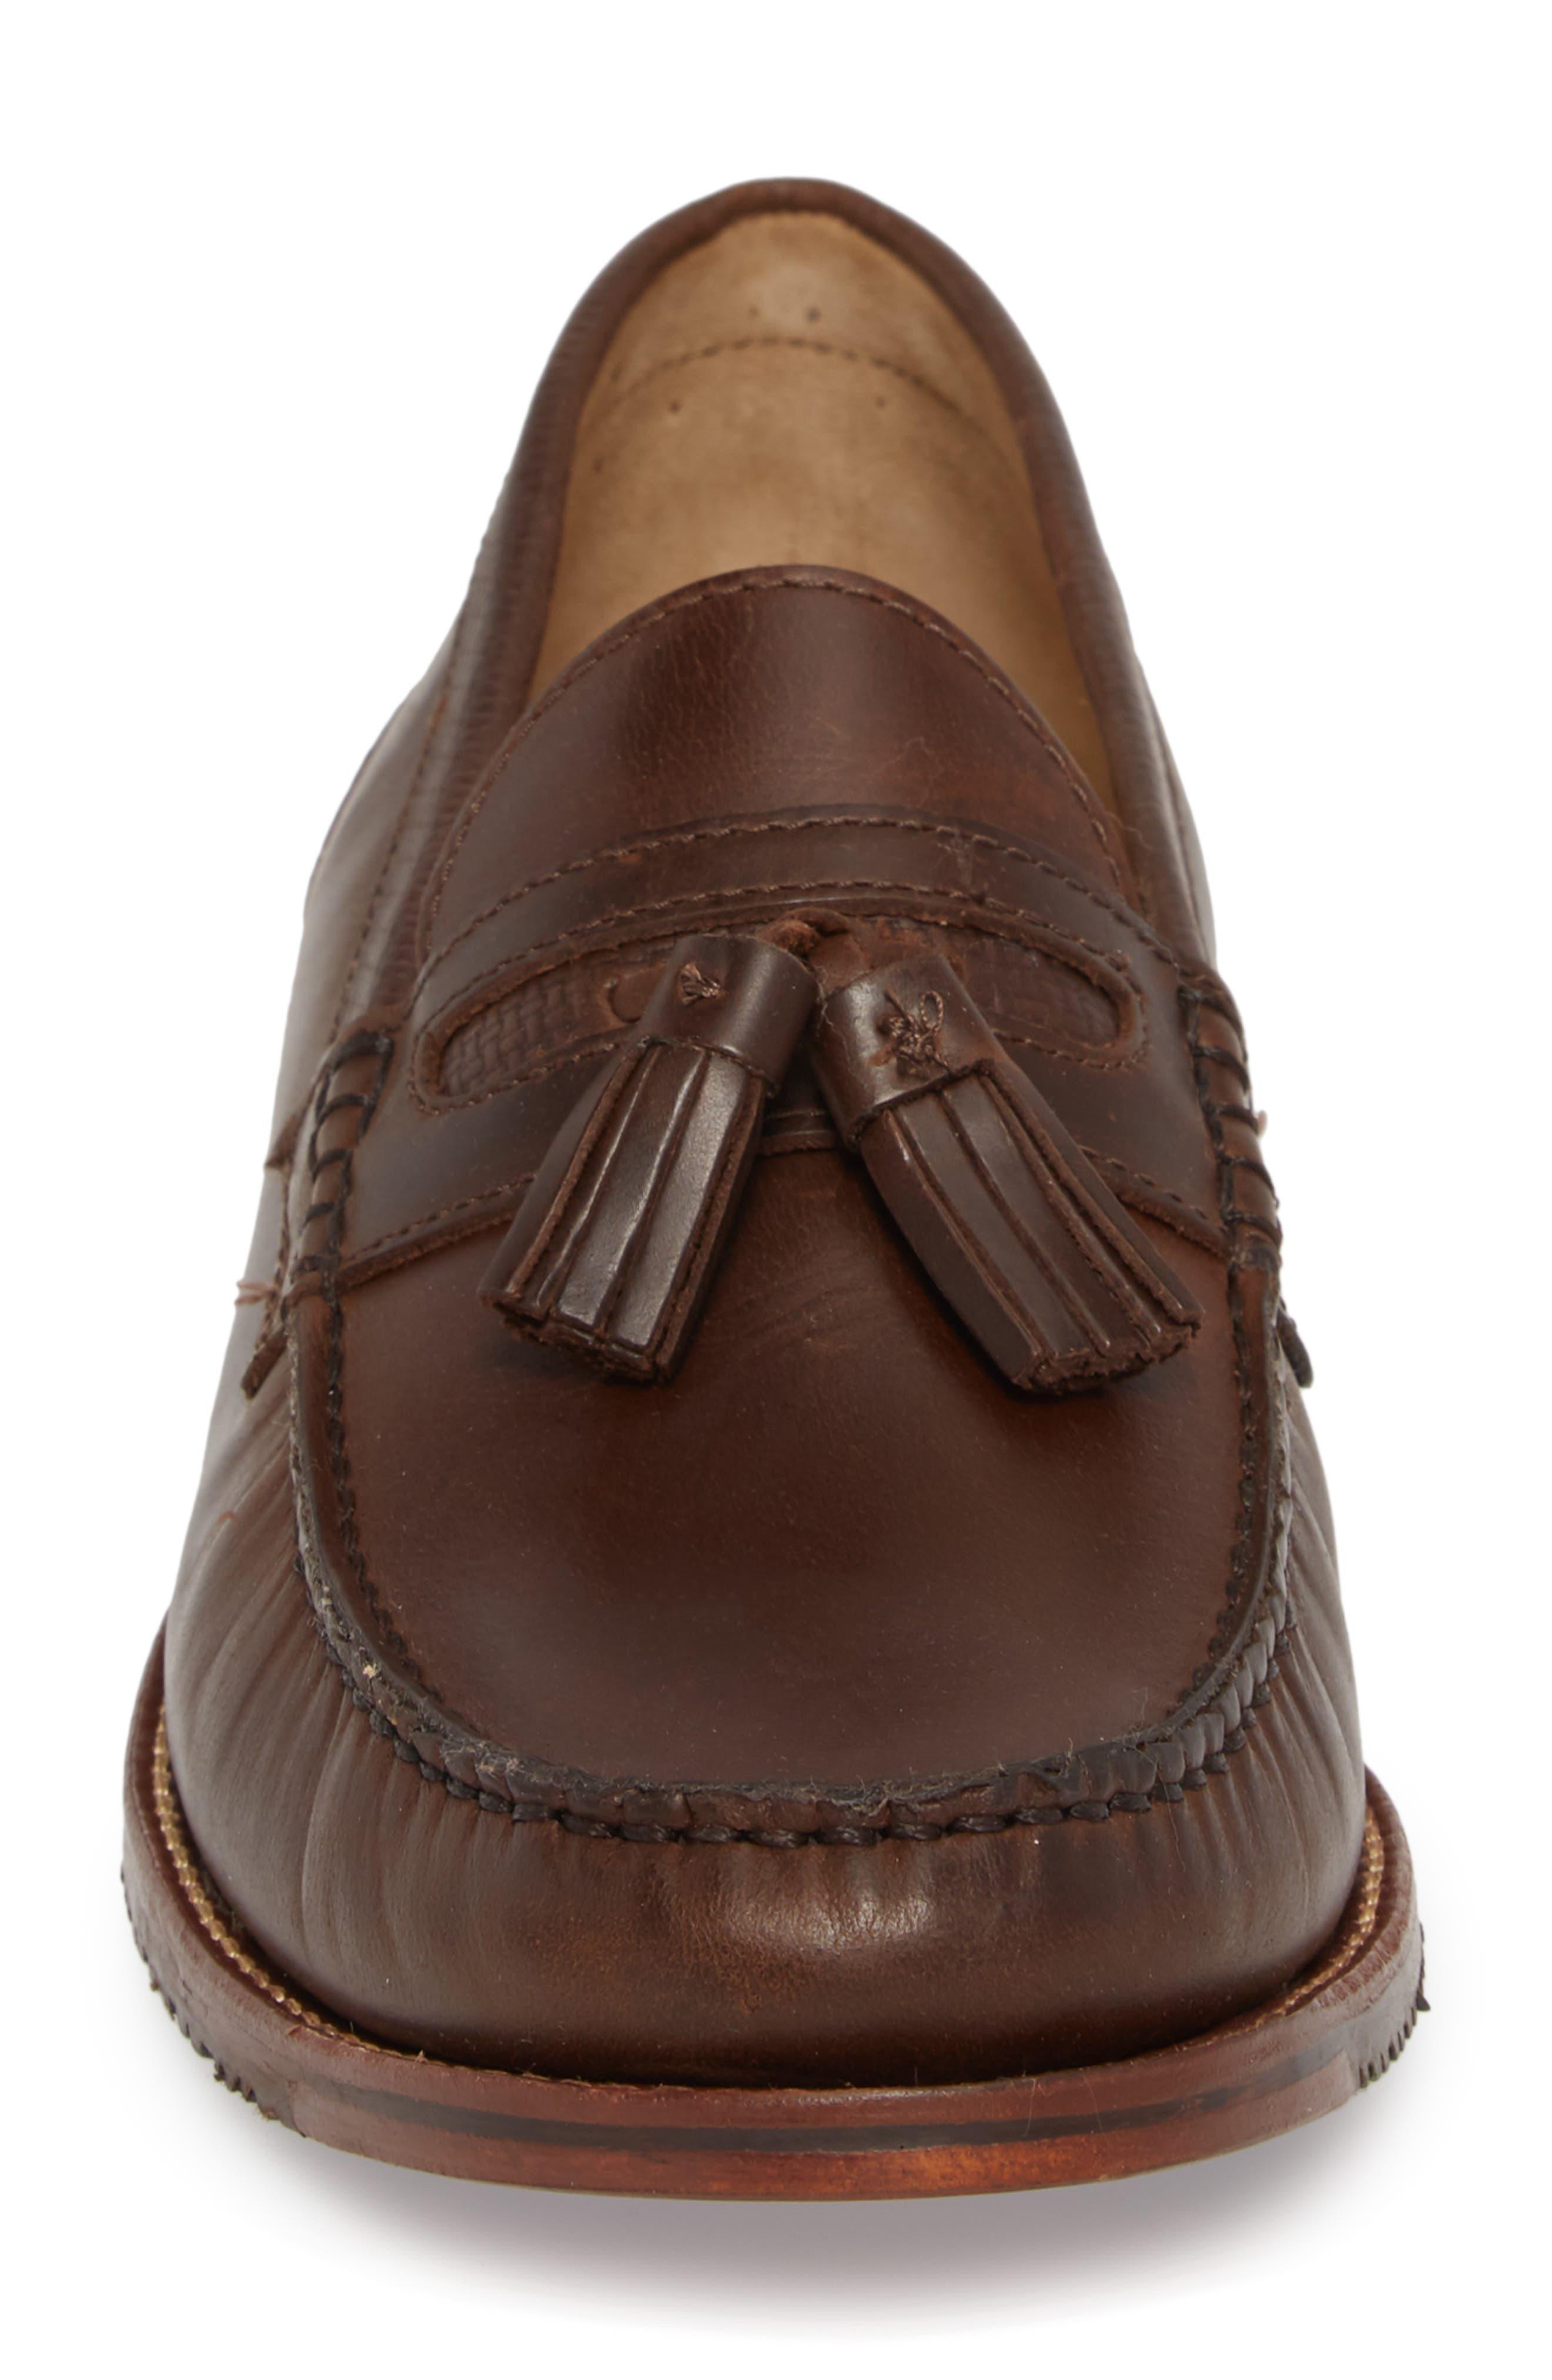 Tasslington Loafer,                             Alternate thumbnail 5, color,                             Dark Brown Leather